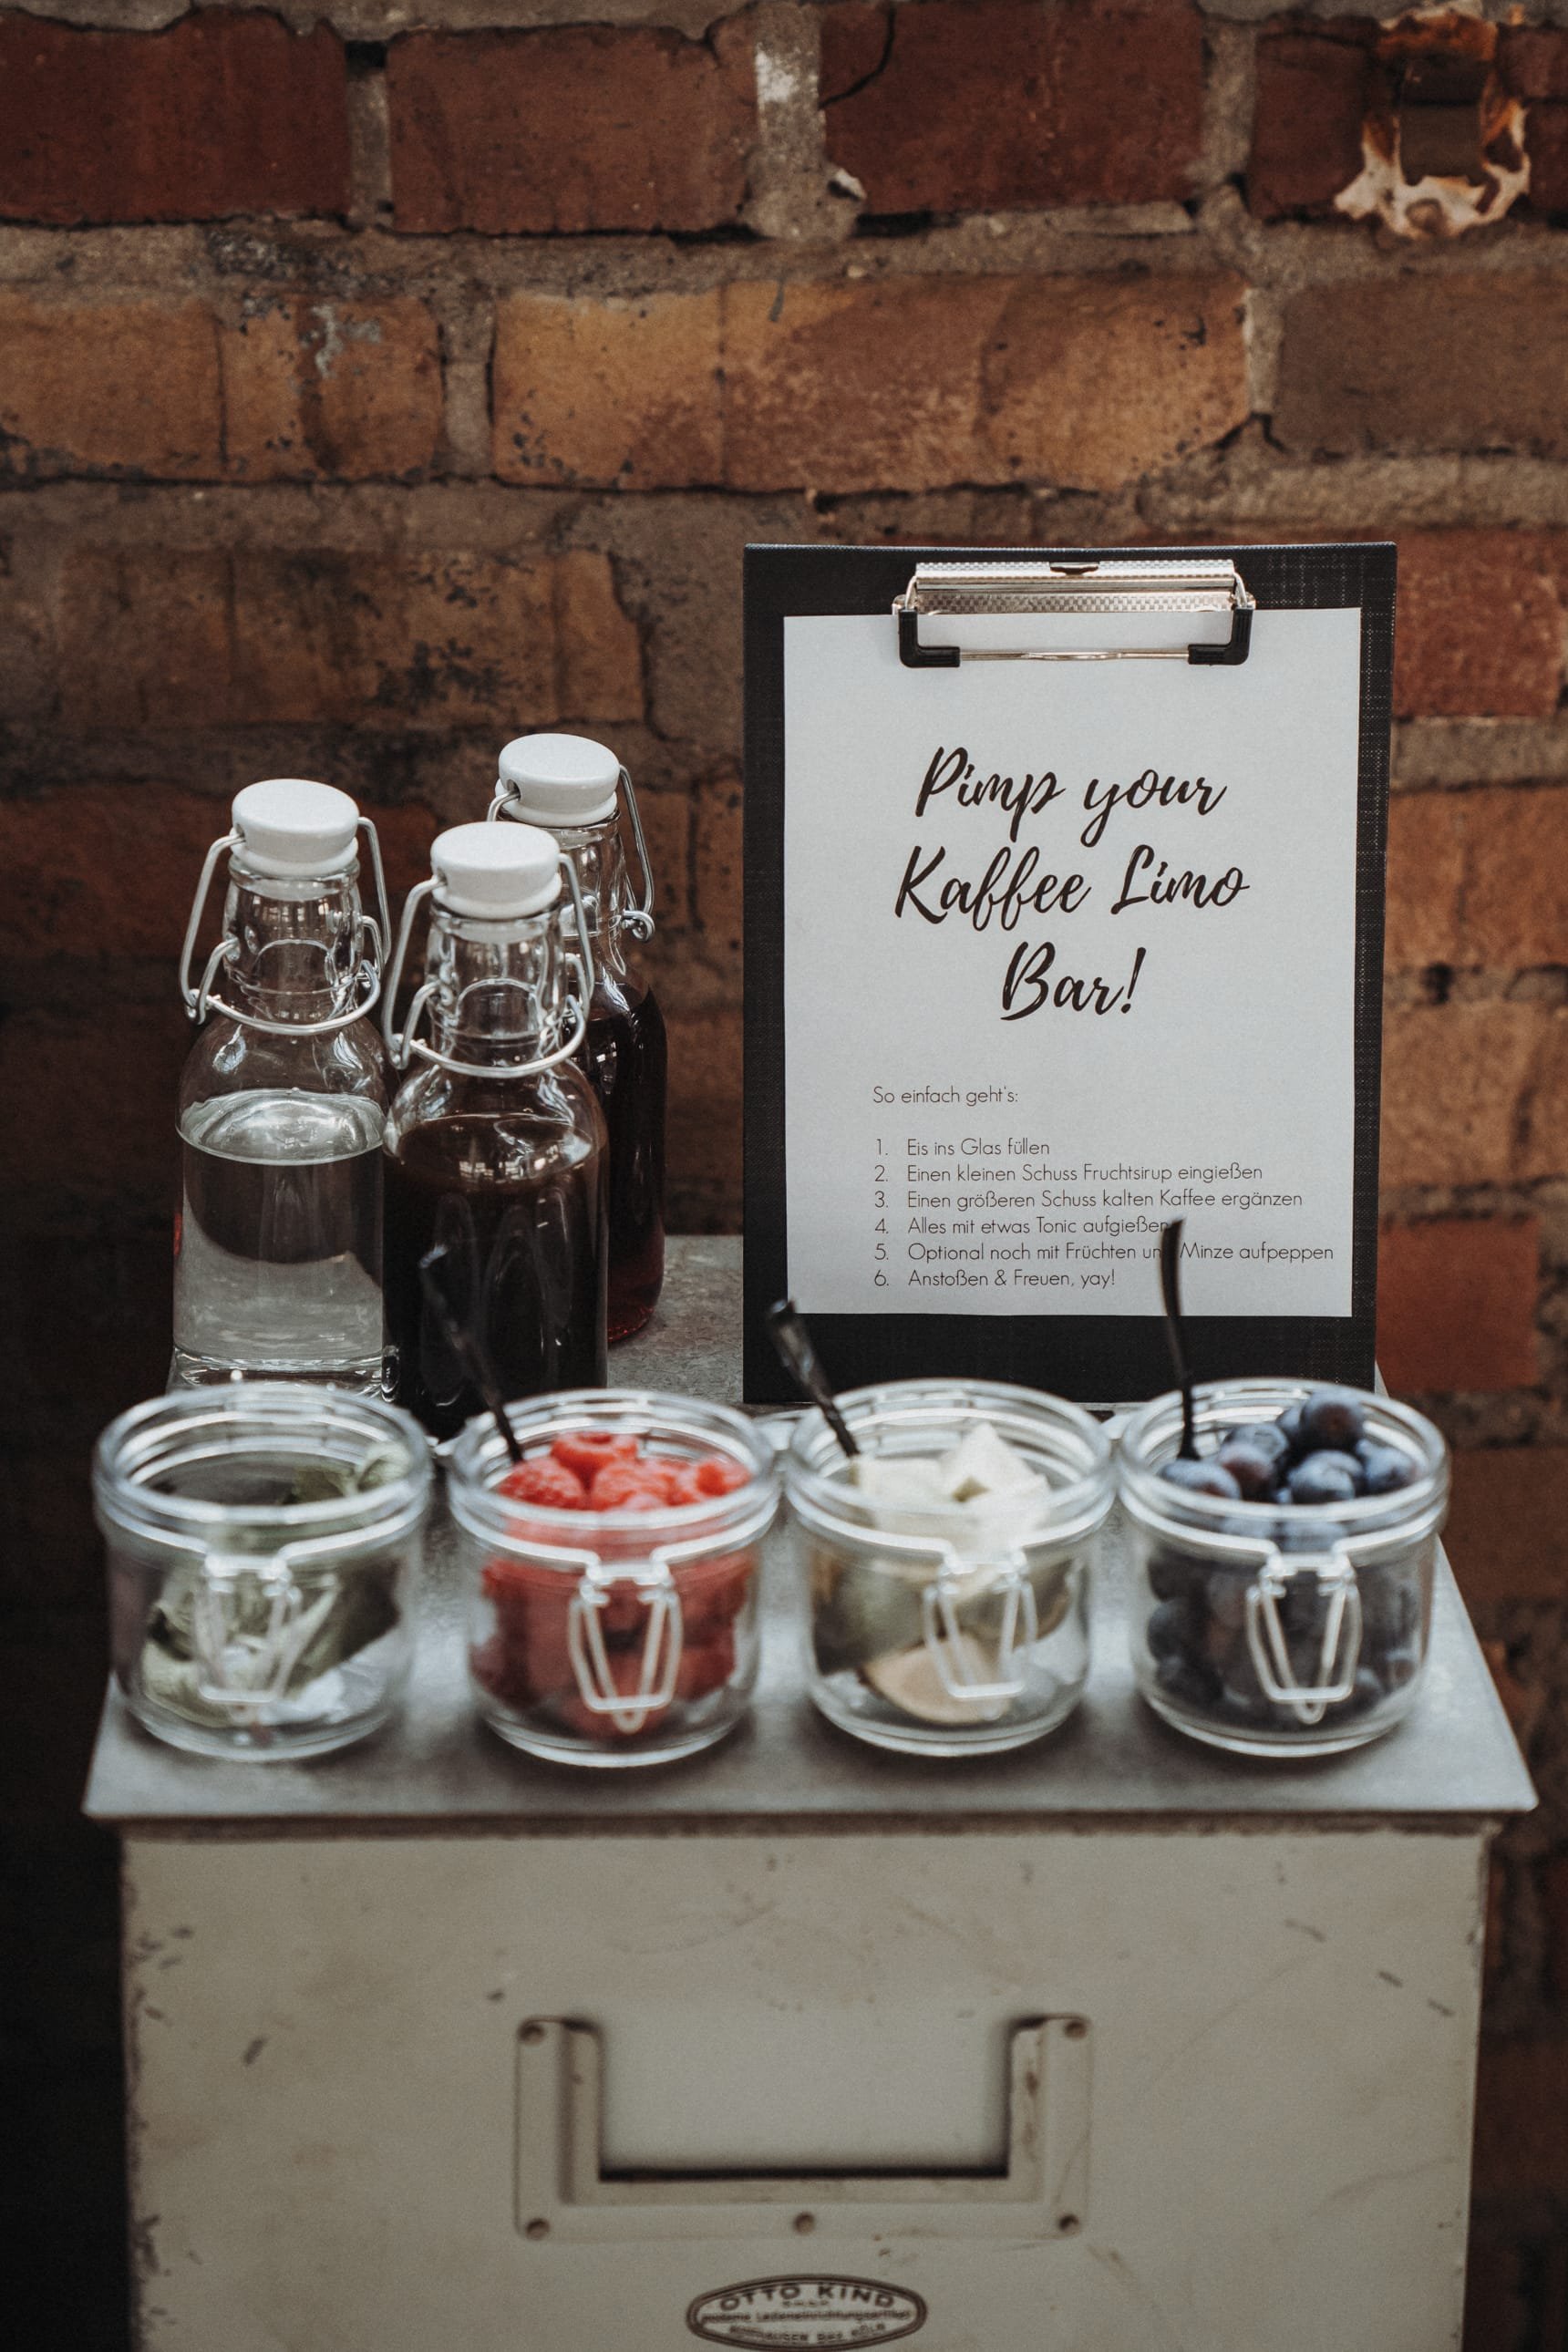 Kaffee_Limonade_als_Getränkebar_03